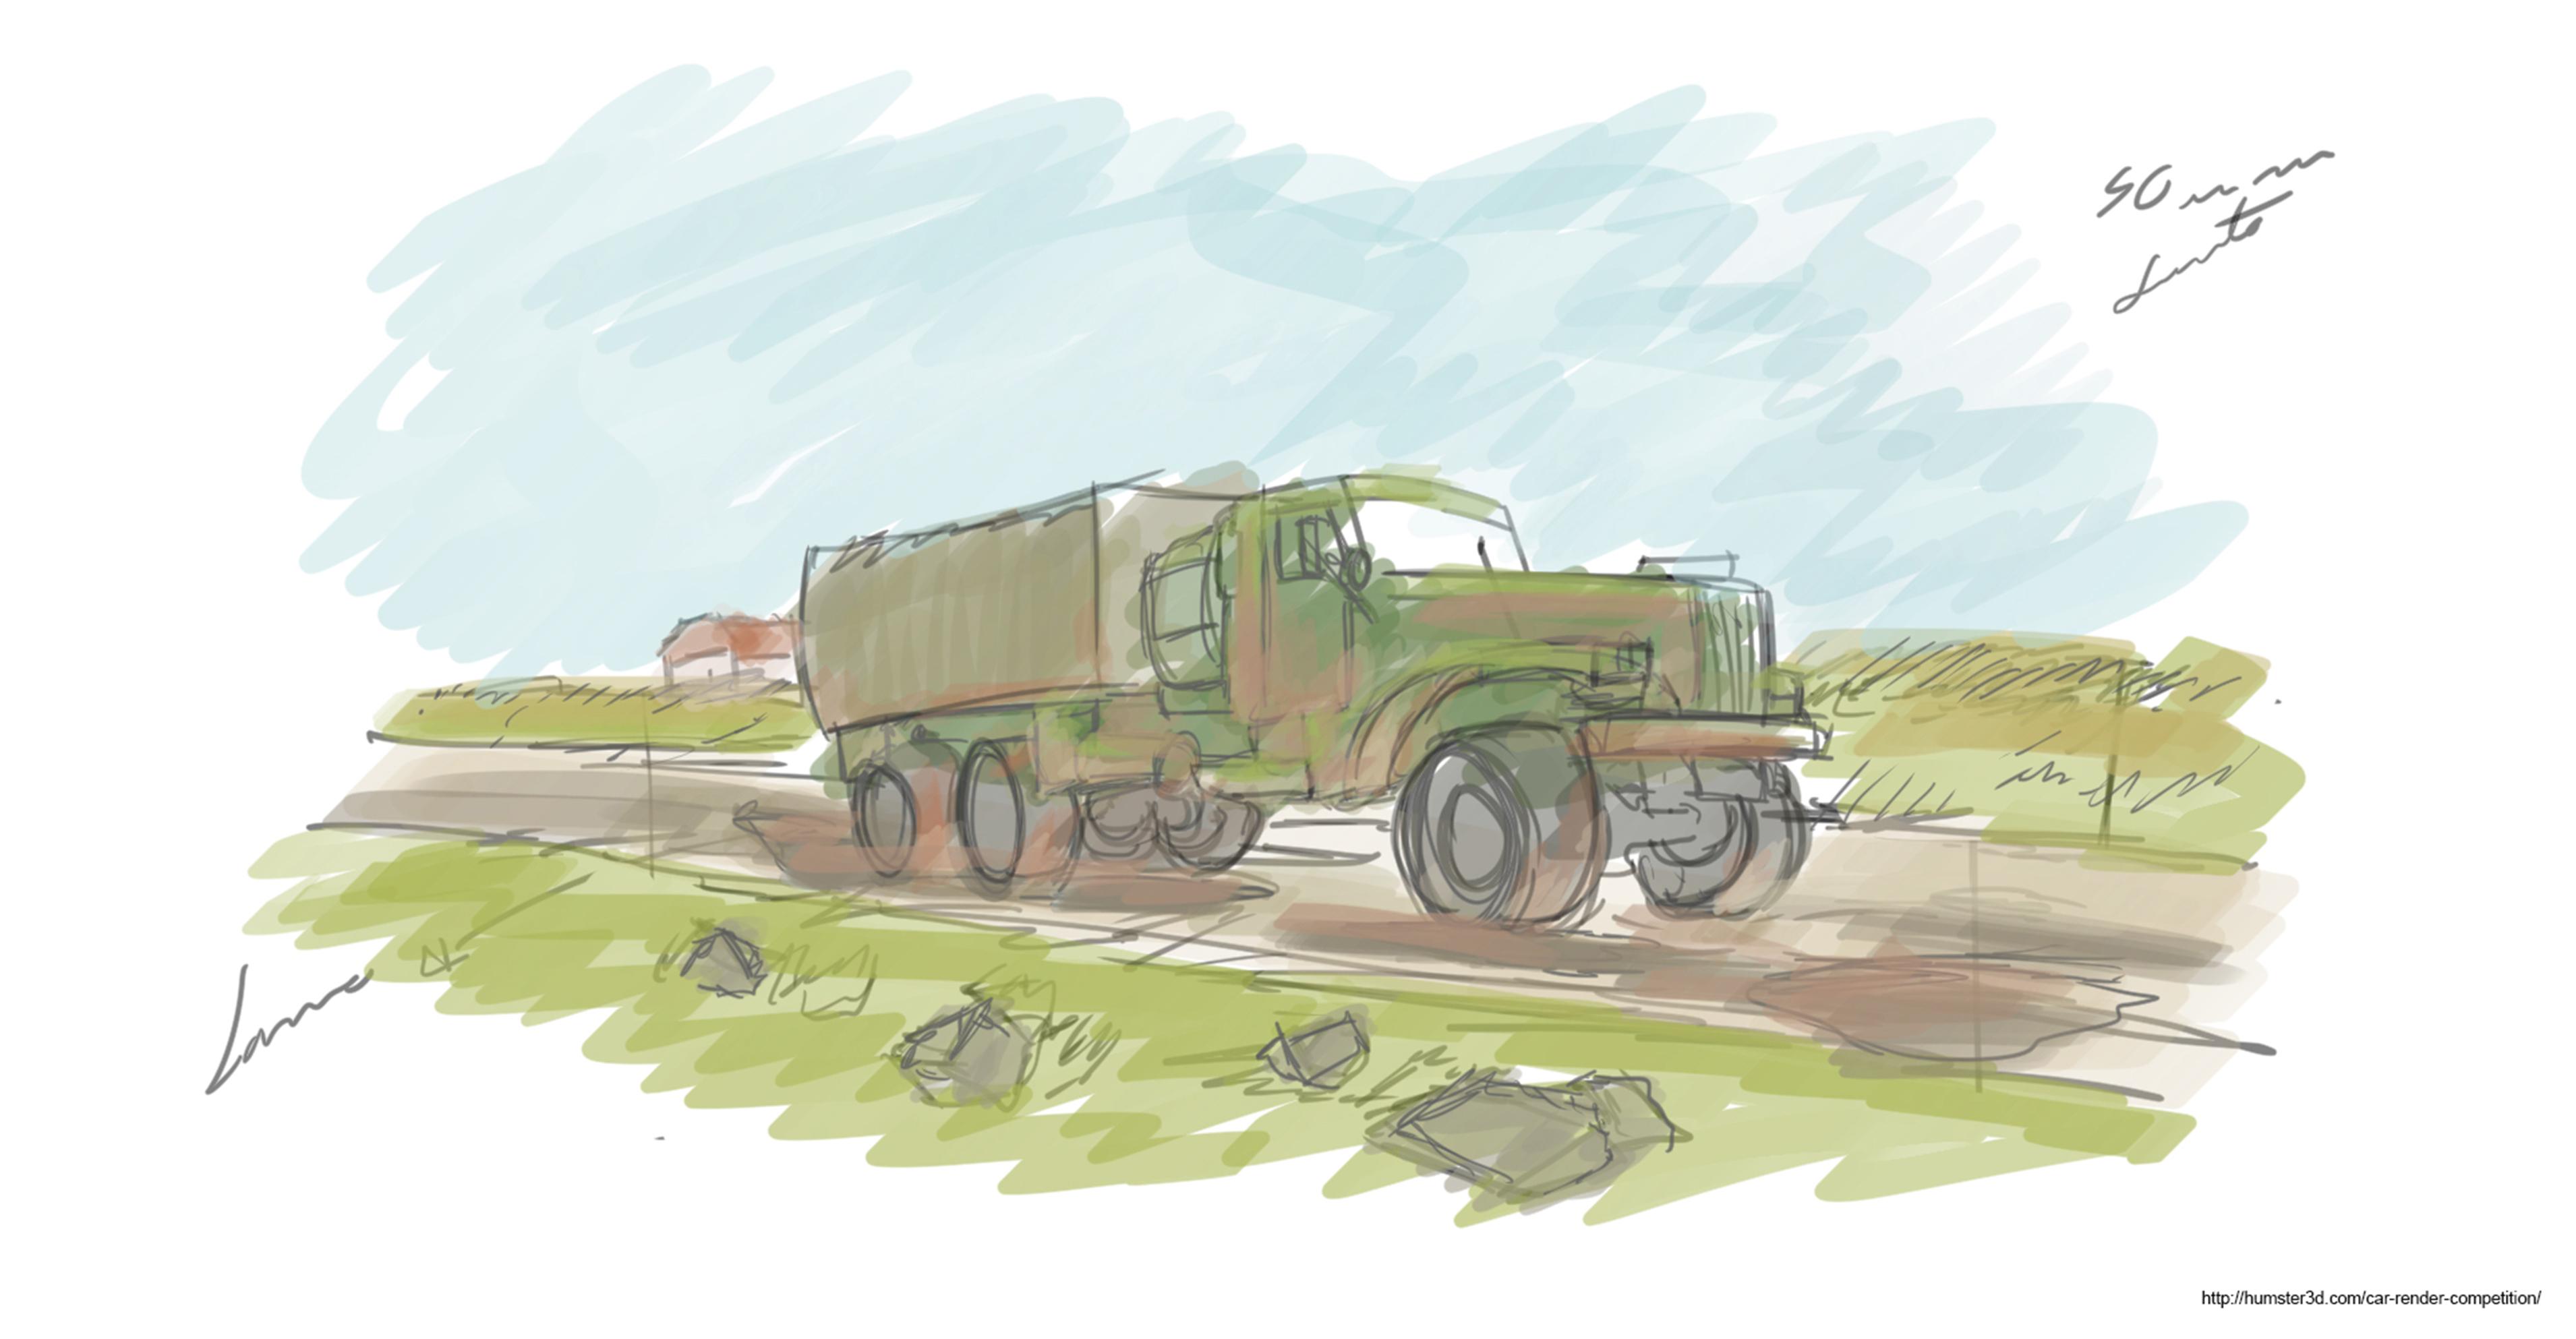 Kraz-255 Concept illustration